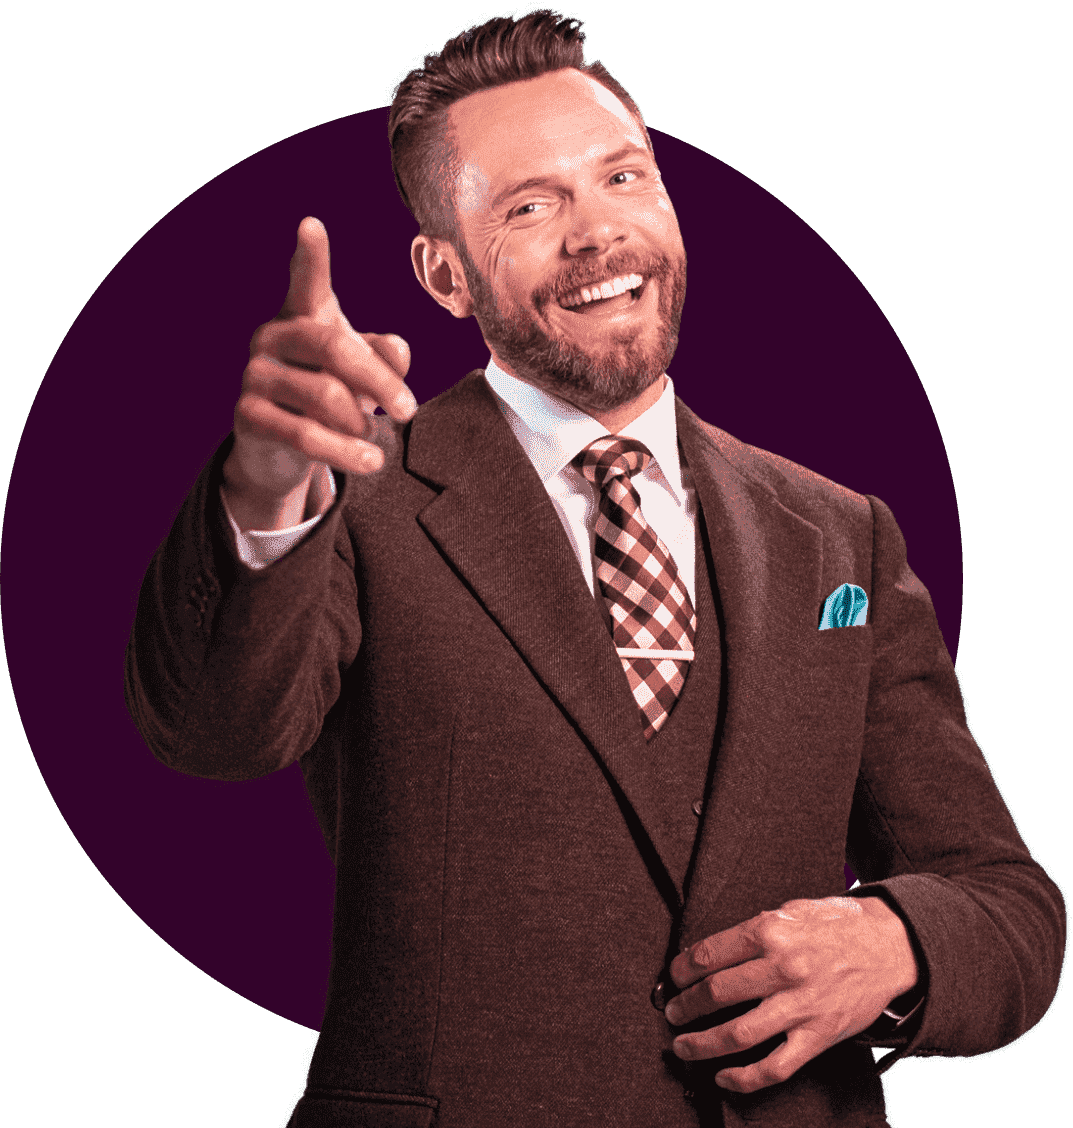 Joel McHale brand ambassador